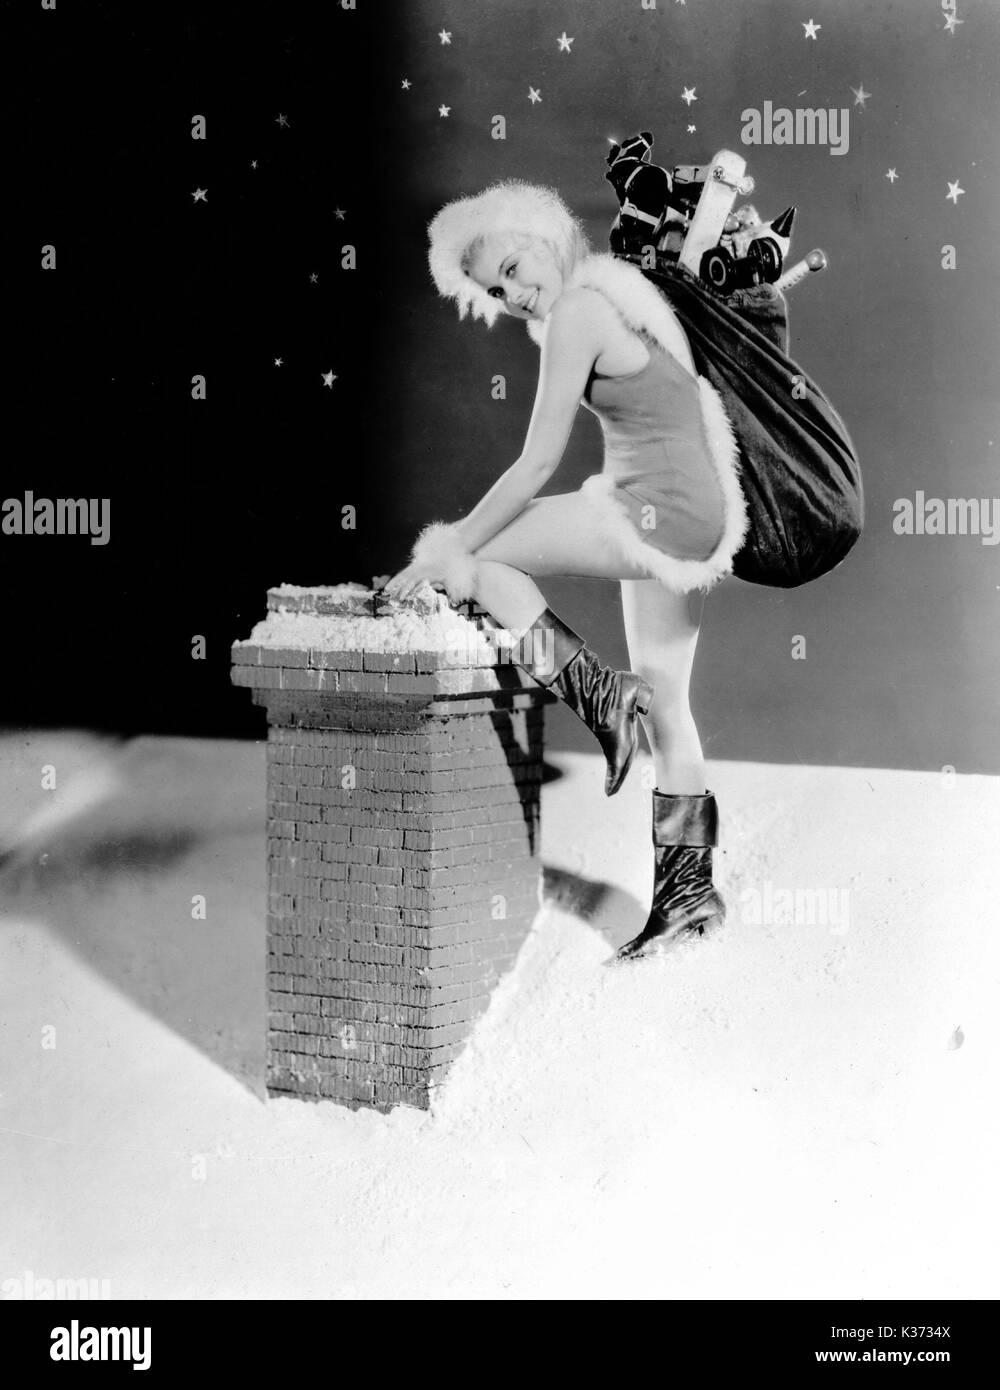 Eva Marie Saint,Asmita Sood 2011 Adult movies Robert Hardy (1925?017),Stacy King